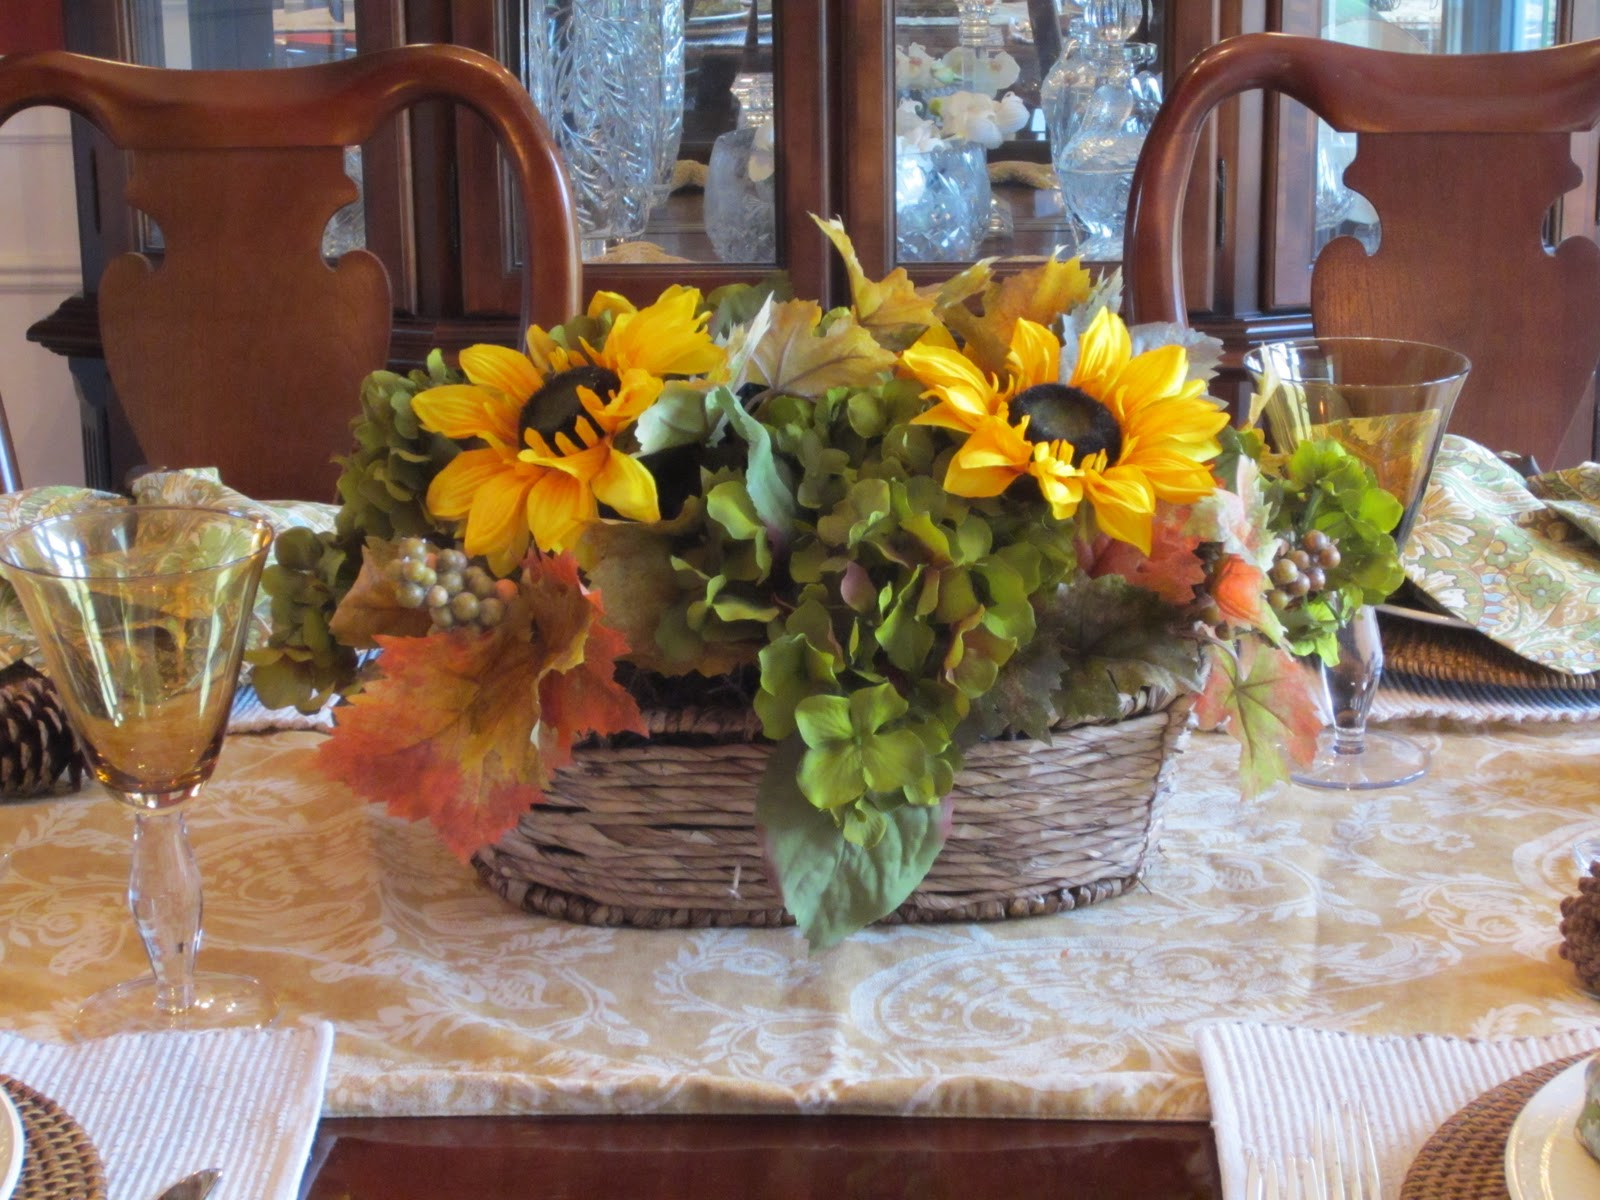 Sunflower arrangement for centerpiece - Thanksgiving Table Setting